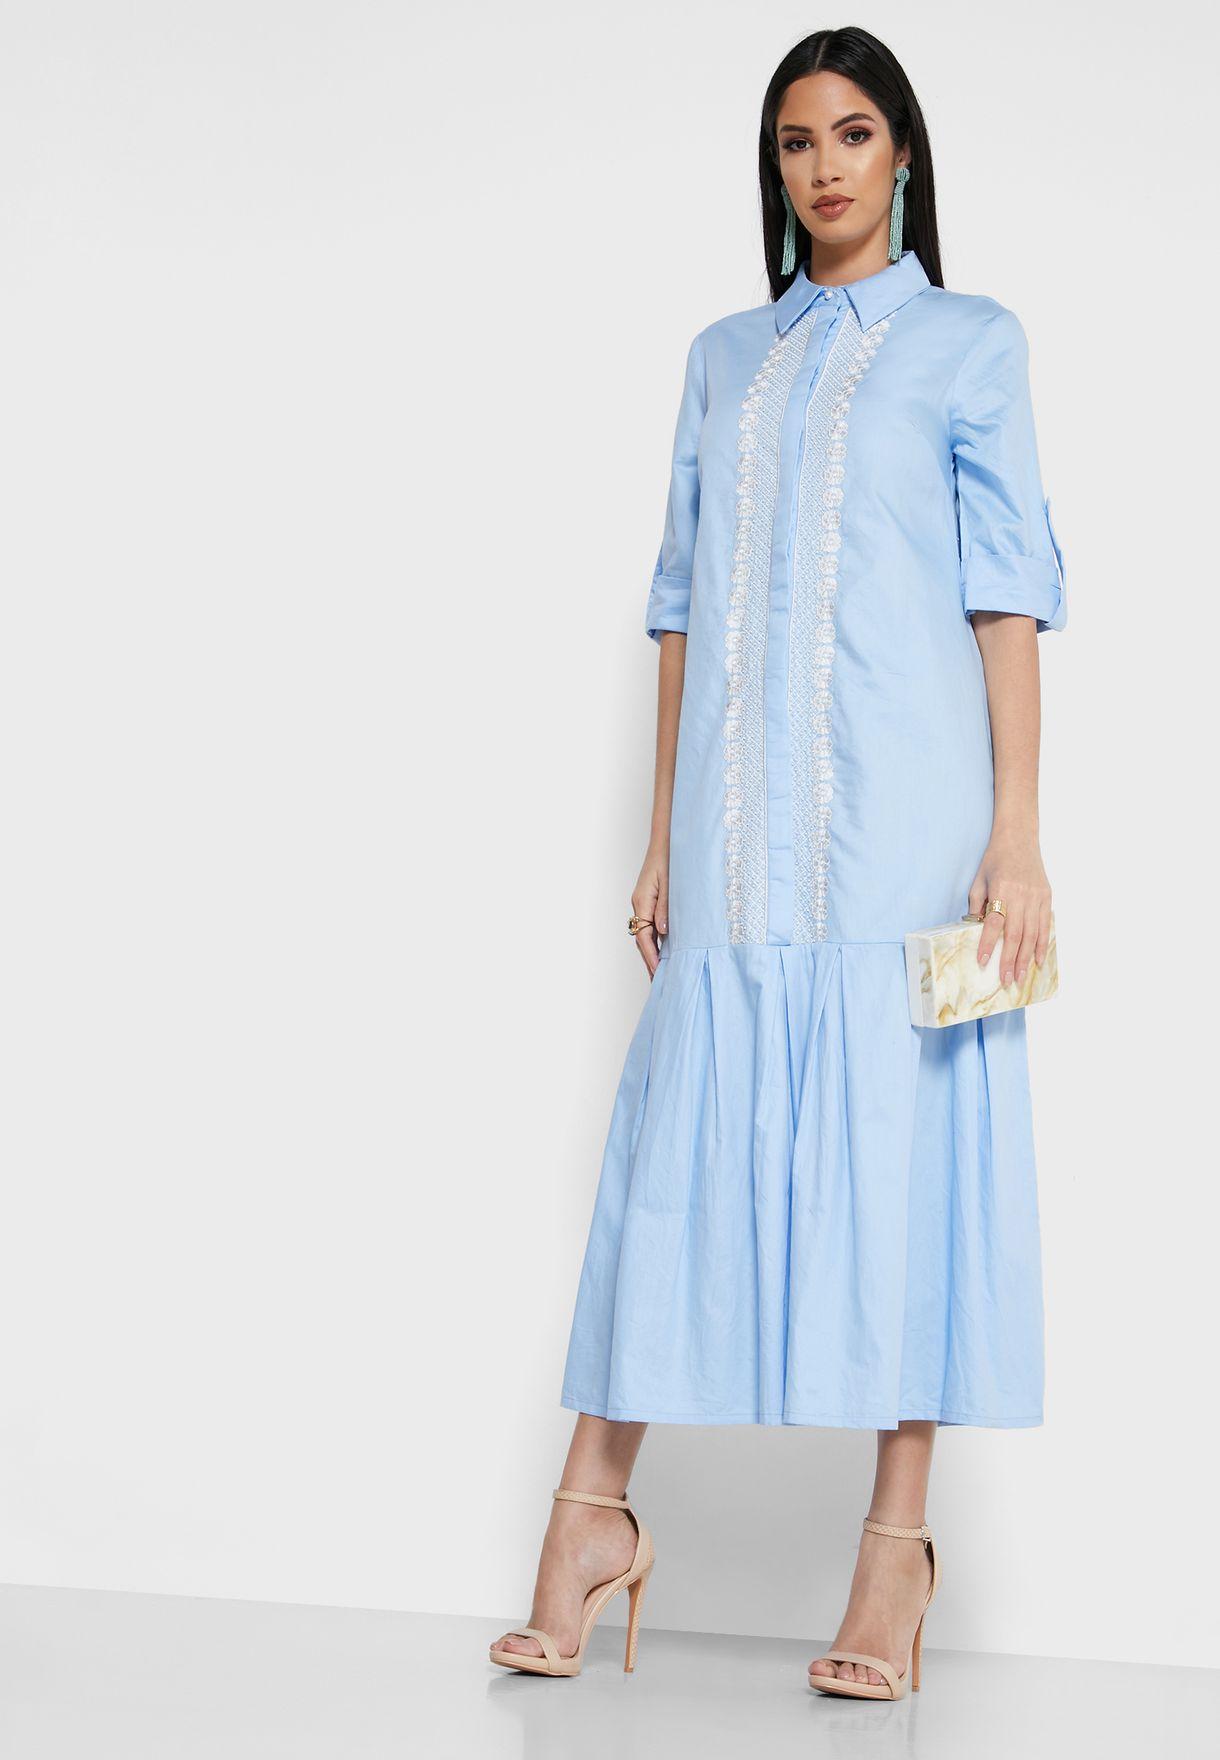 فستان مطرز مزين بكسرات